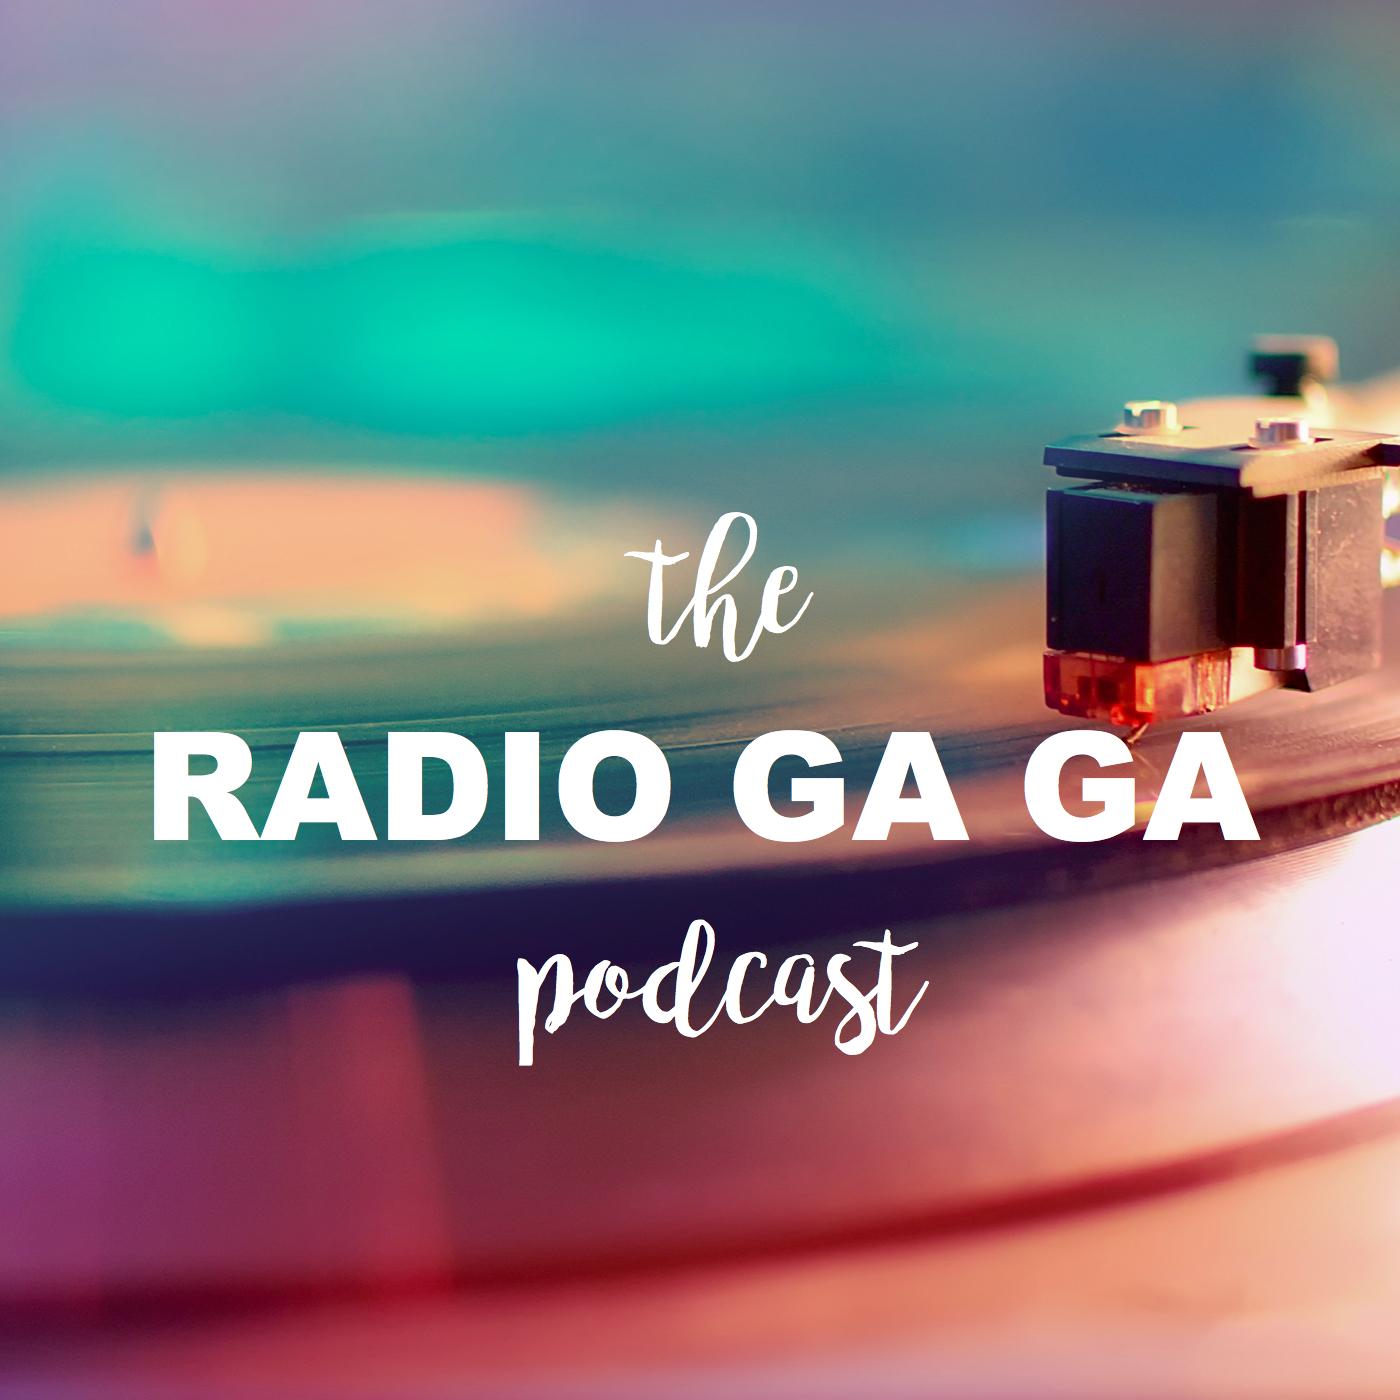 The Radio Ga Ga Podcast